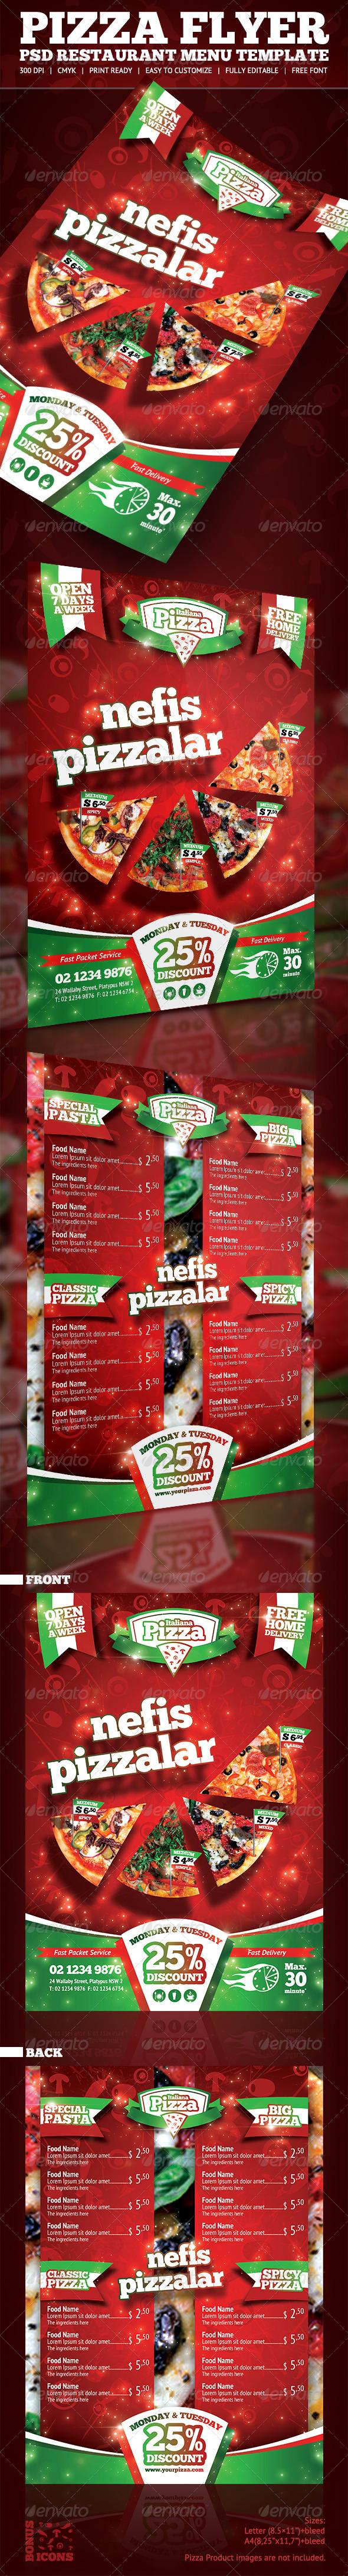 Pizza Menu Flyer PSD Template